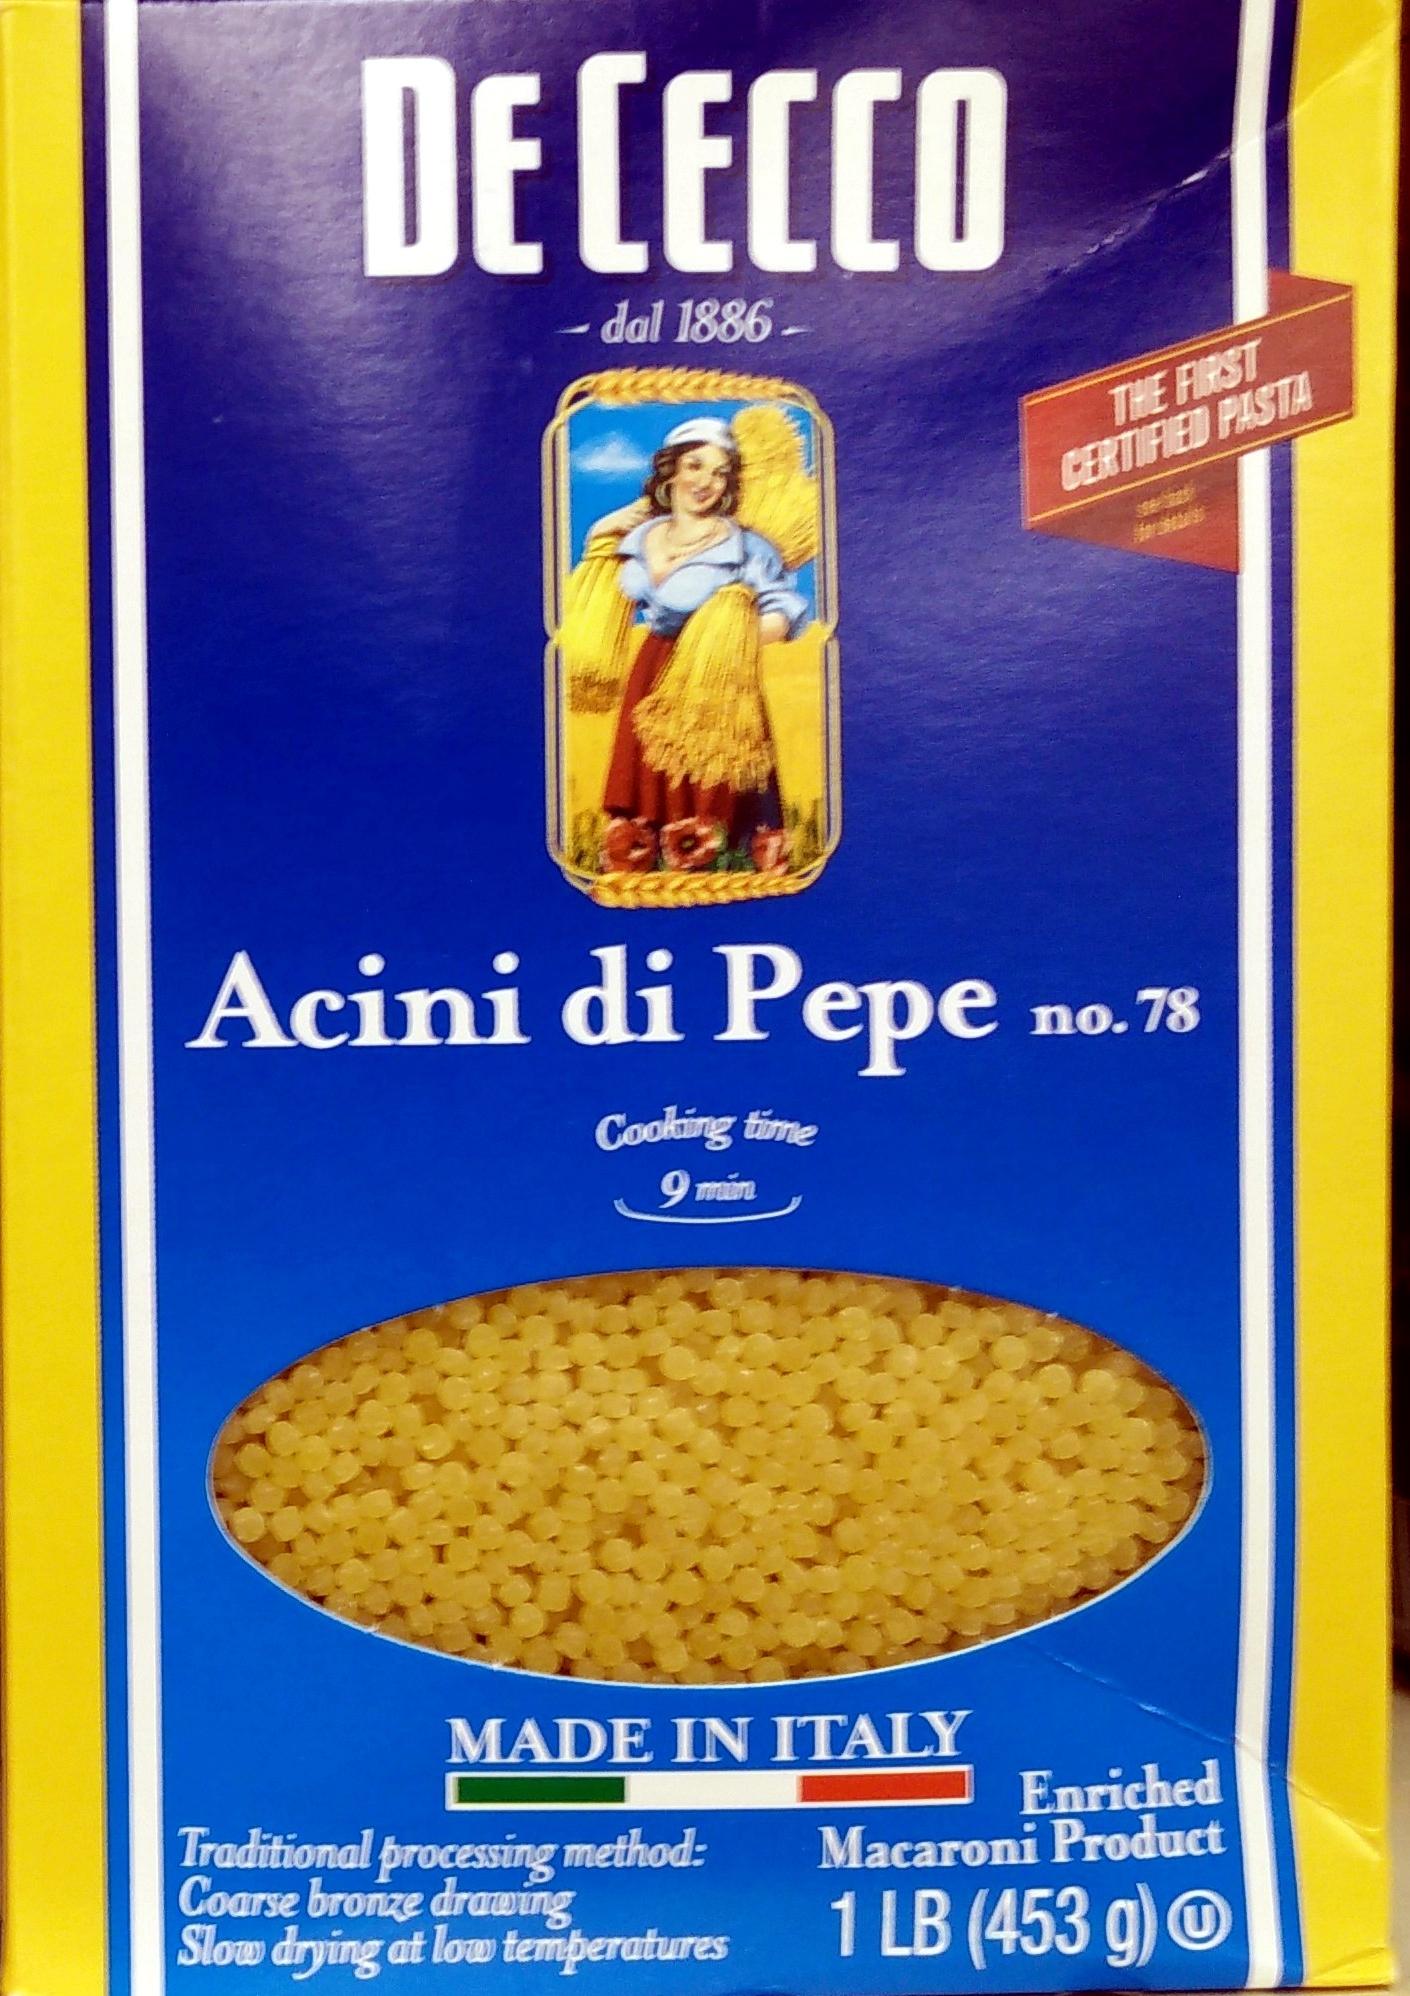 Acini di Pepe no. 78 - Product